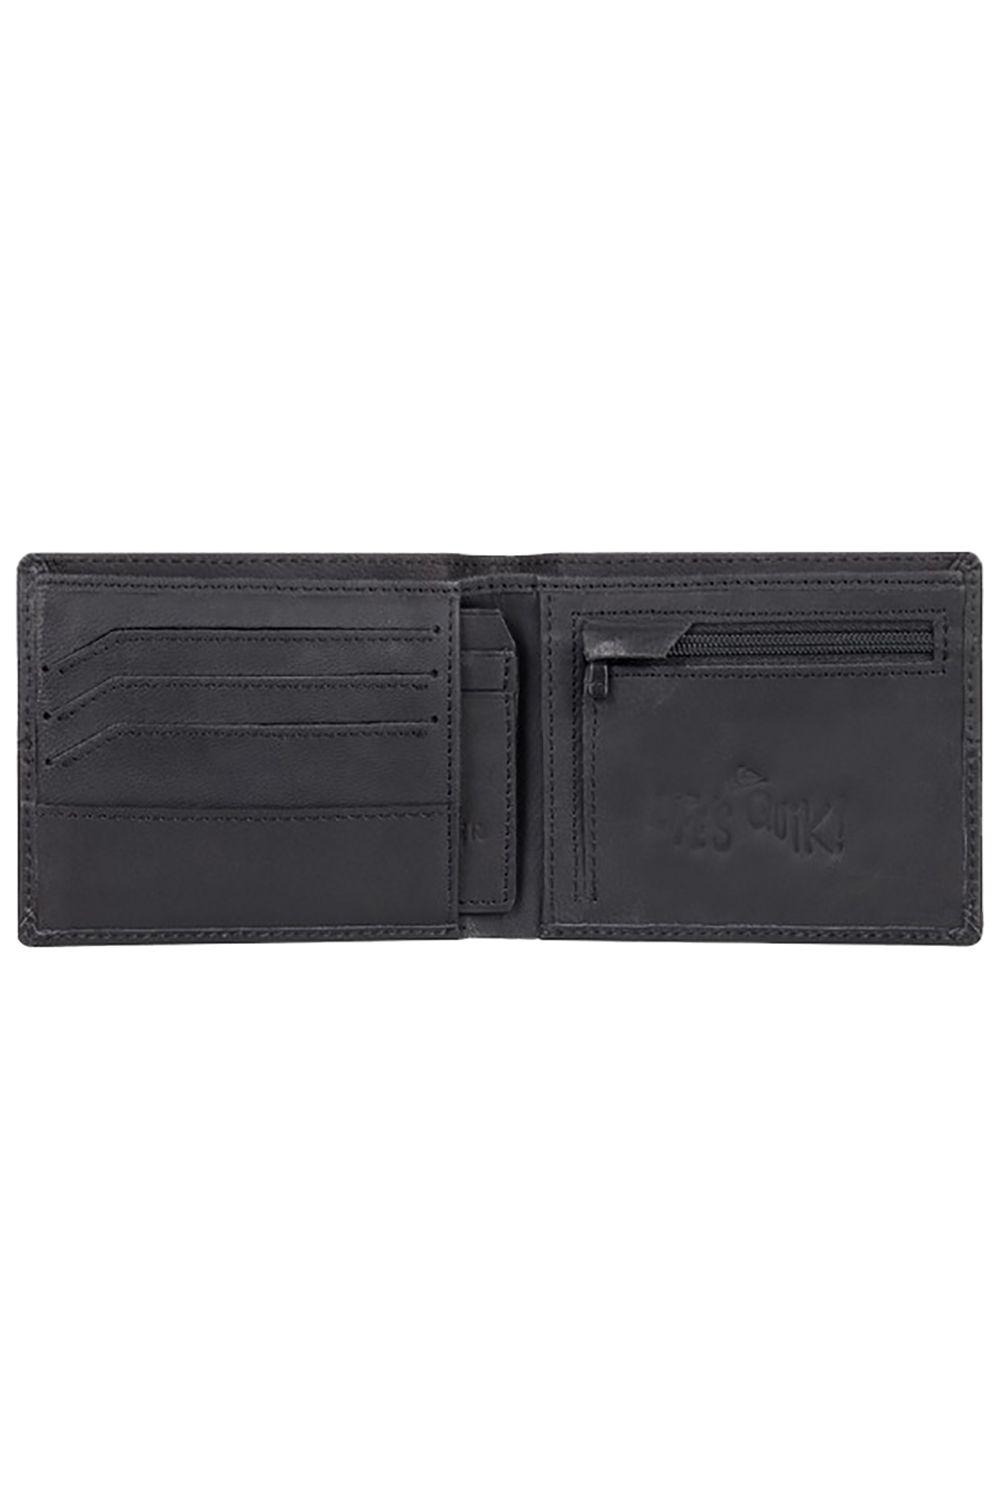 Quiksilver Leather Wallet DESERTRUKER Black